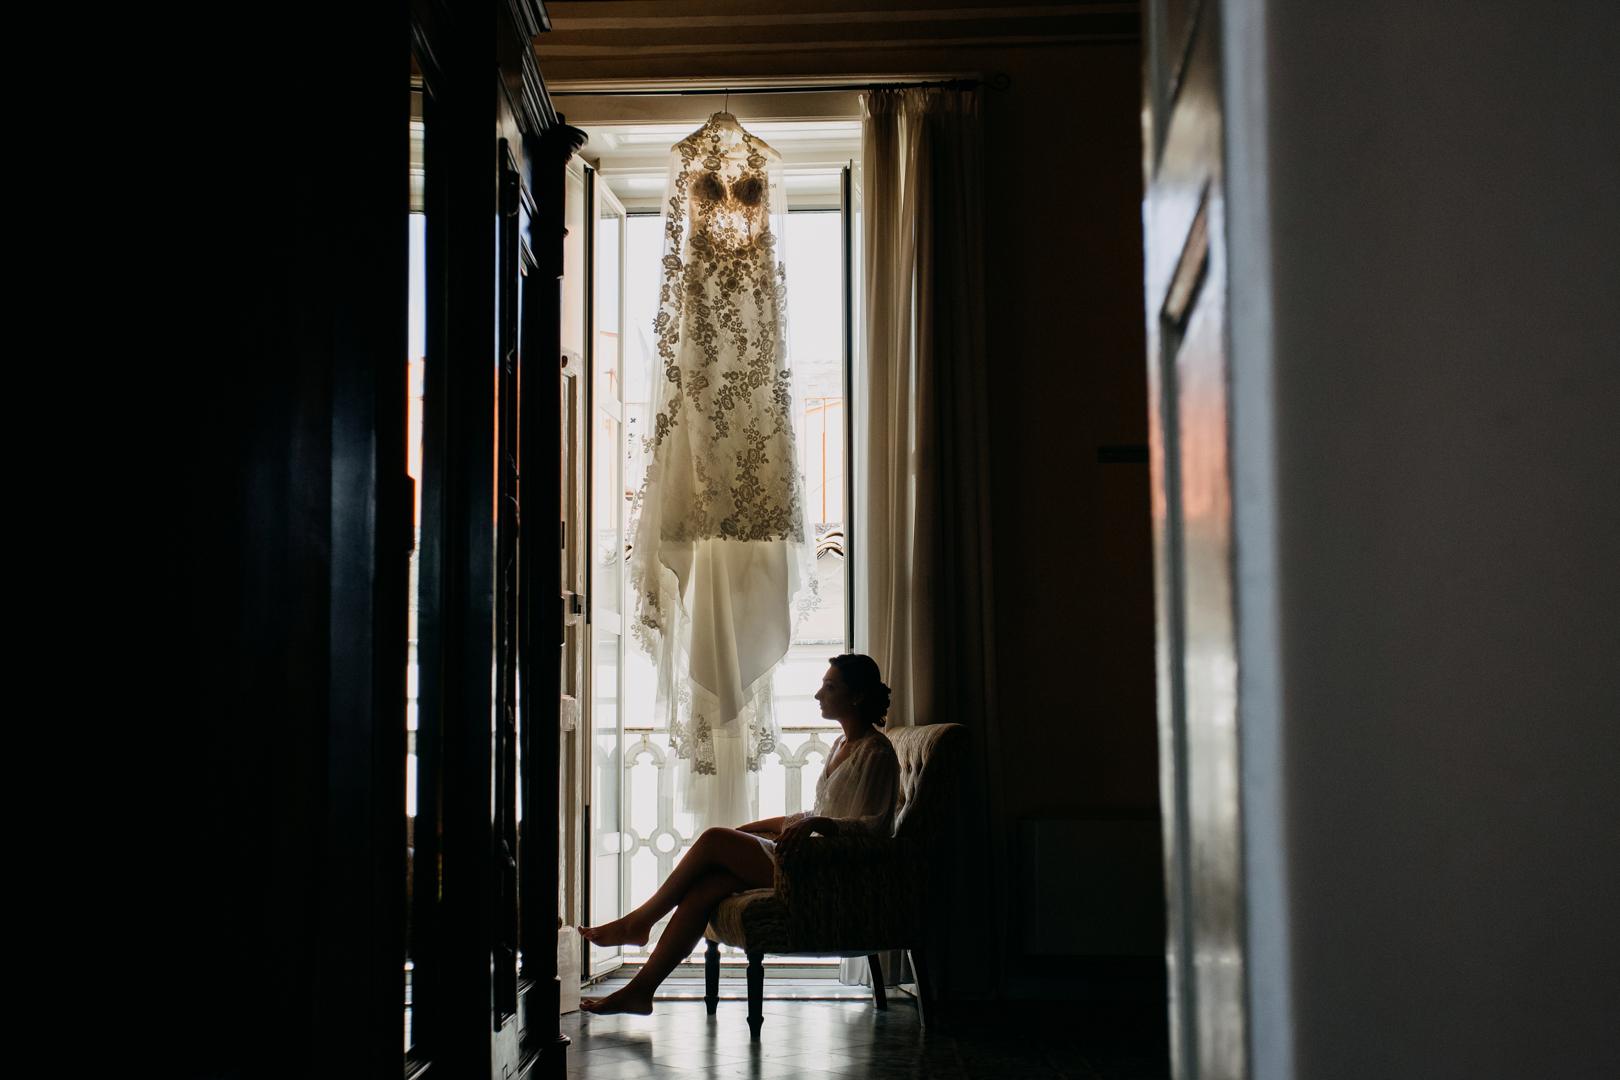 18 gianni-lepore-bride-sposa-abito-getting-ready-preparativi-weddingday-weddingdress